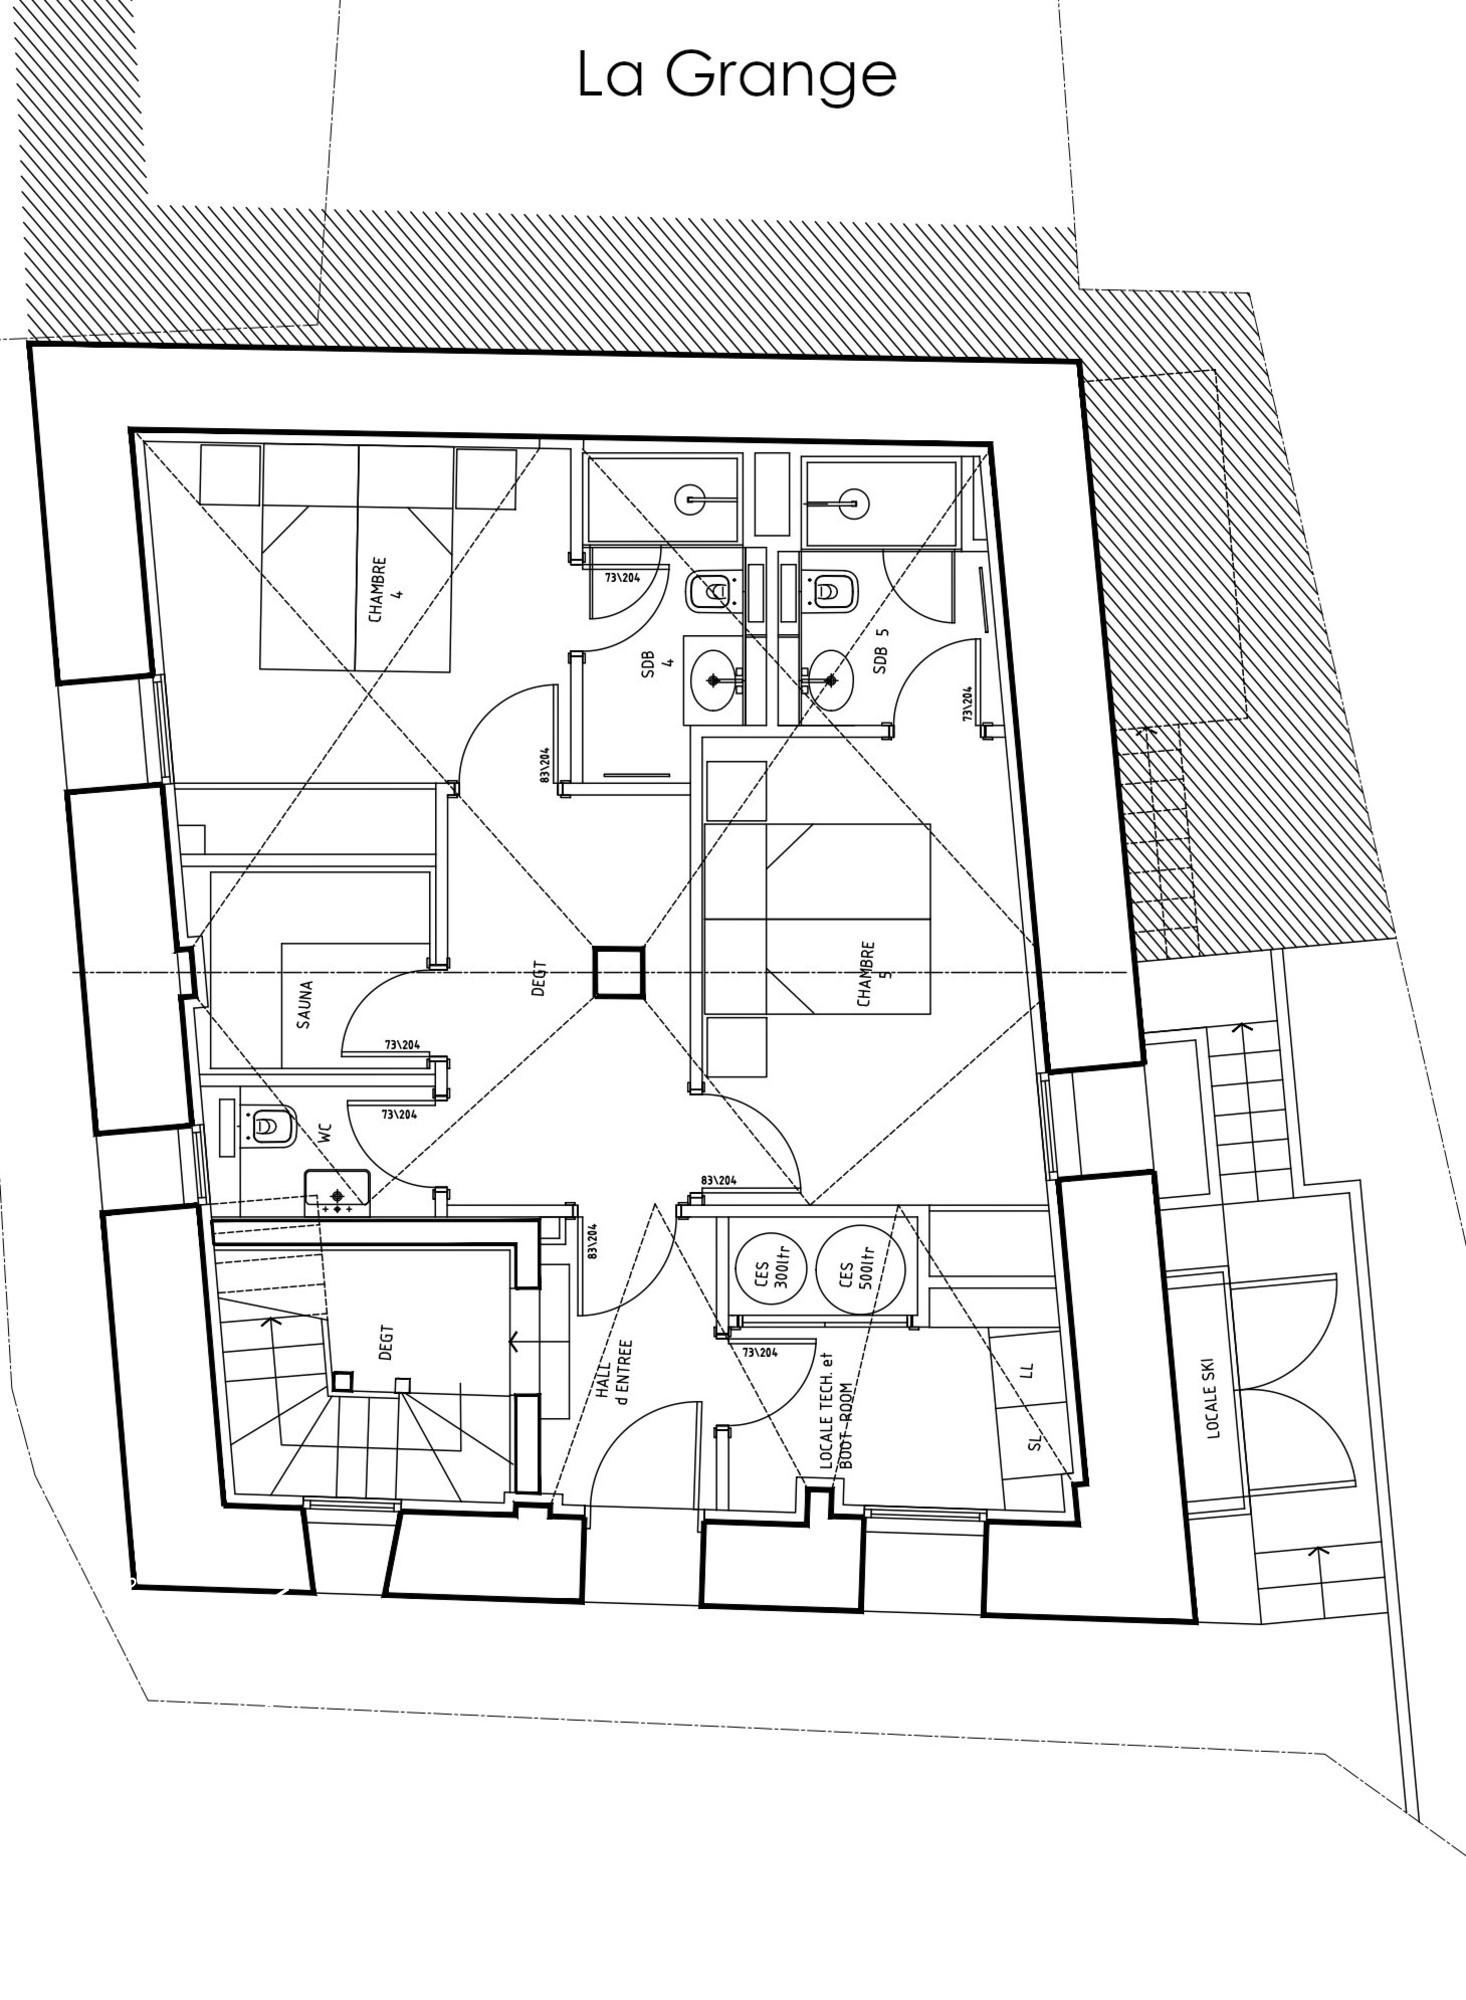 Chalet La Grange 1855 St-Martin-de-Belleville Floor Plan 1